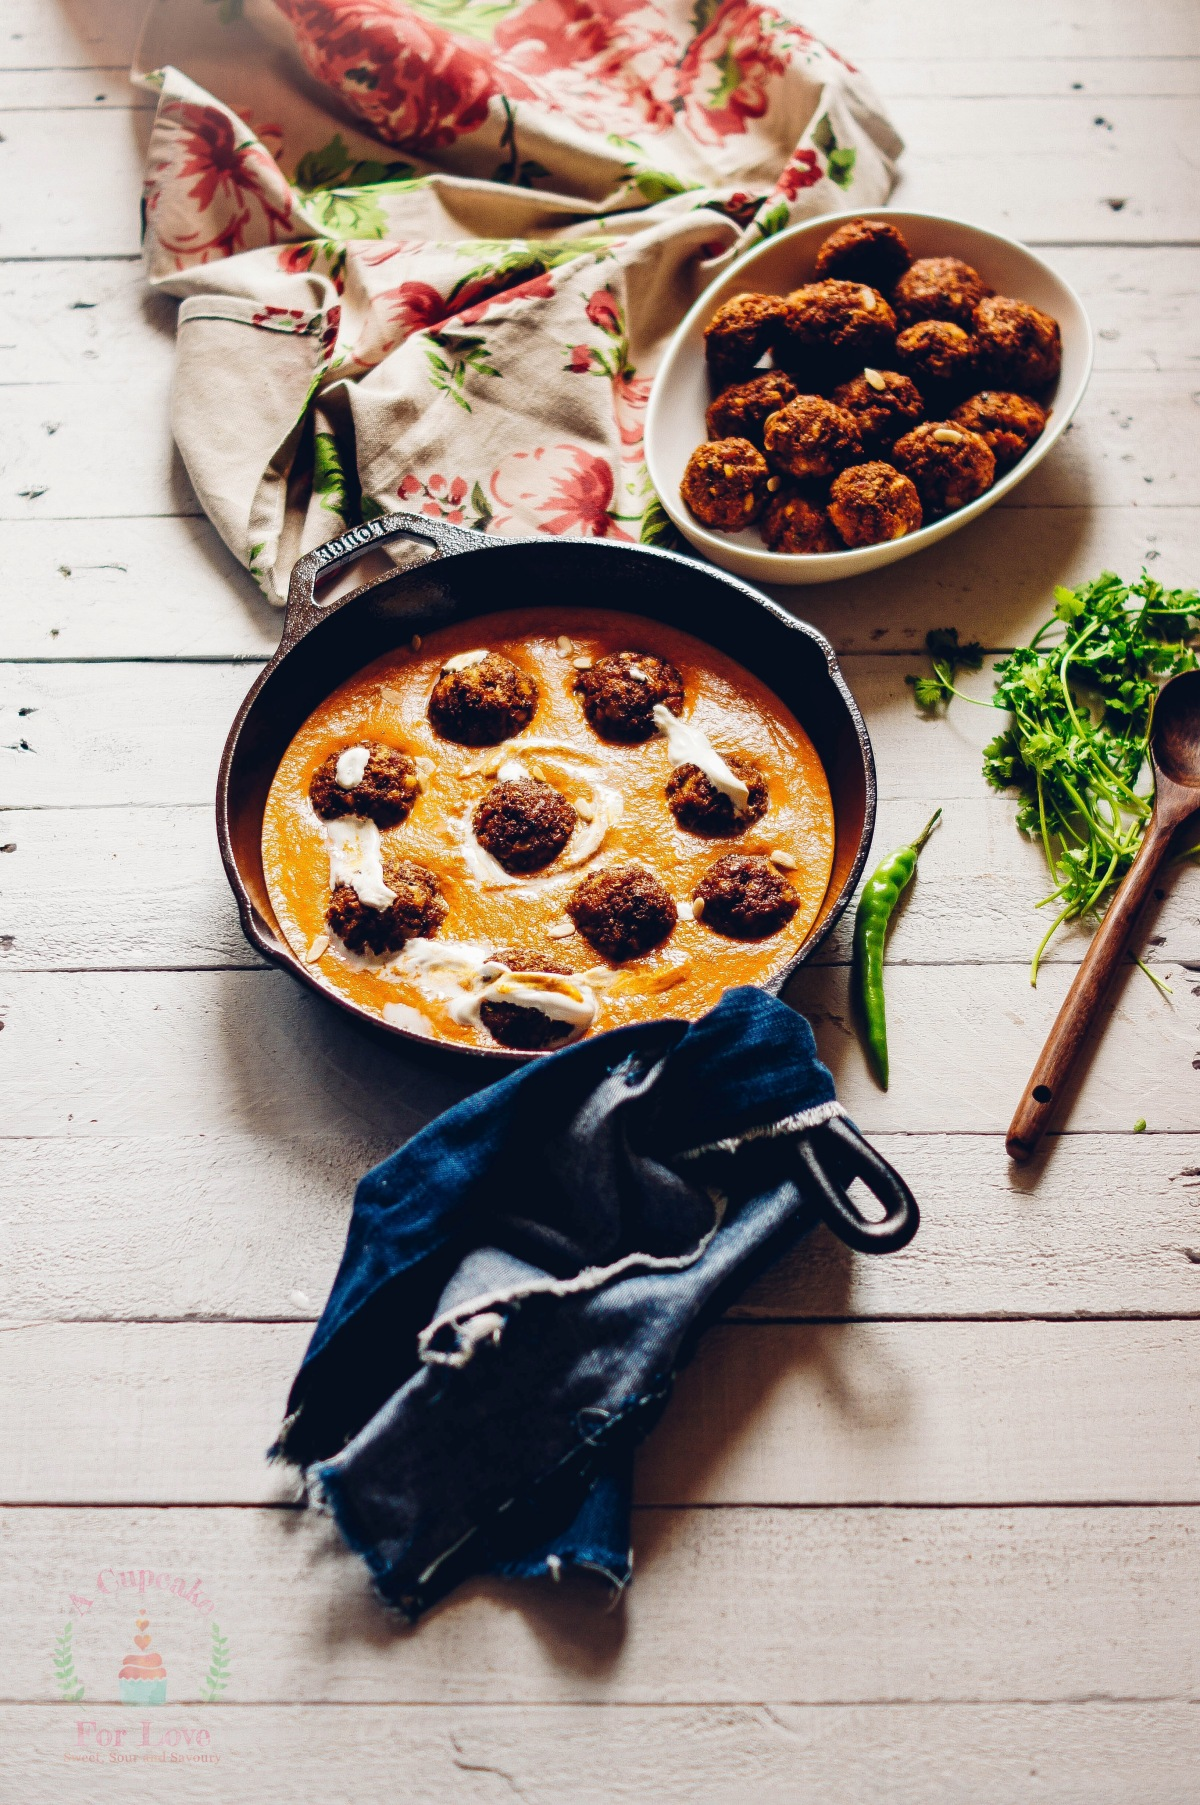 Keema Kofta – Mutton Meat Balls curried in a spicy tomatogravy